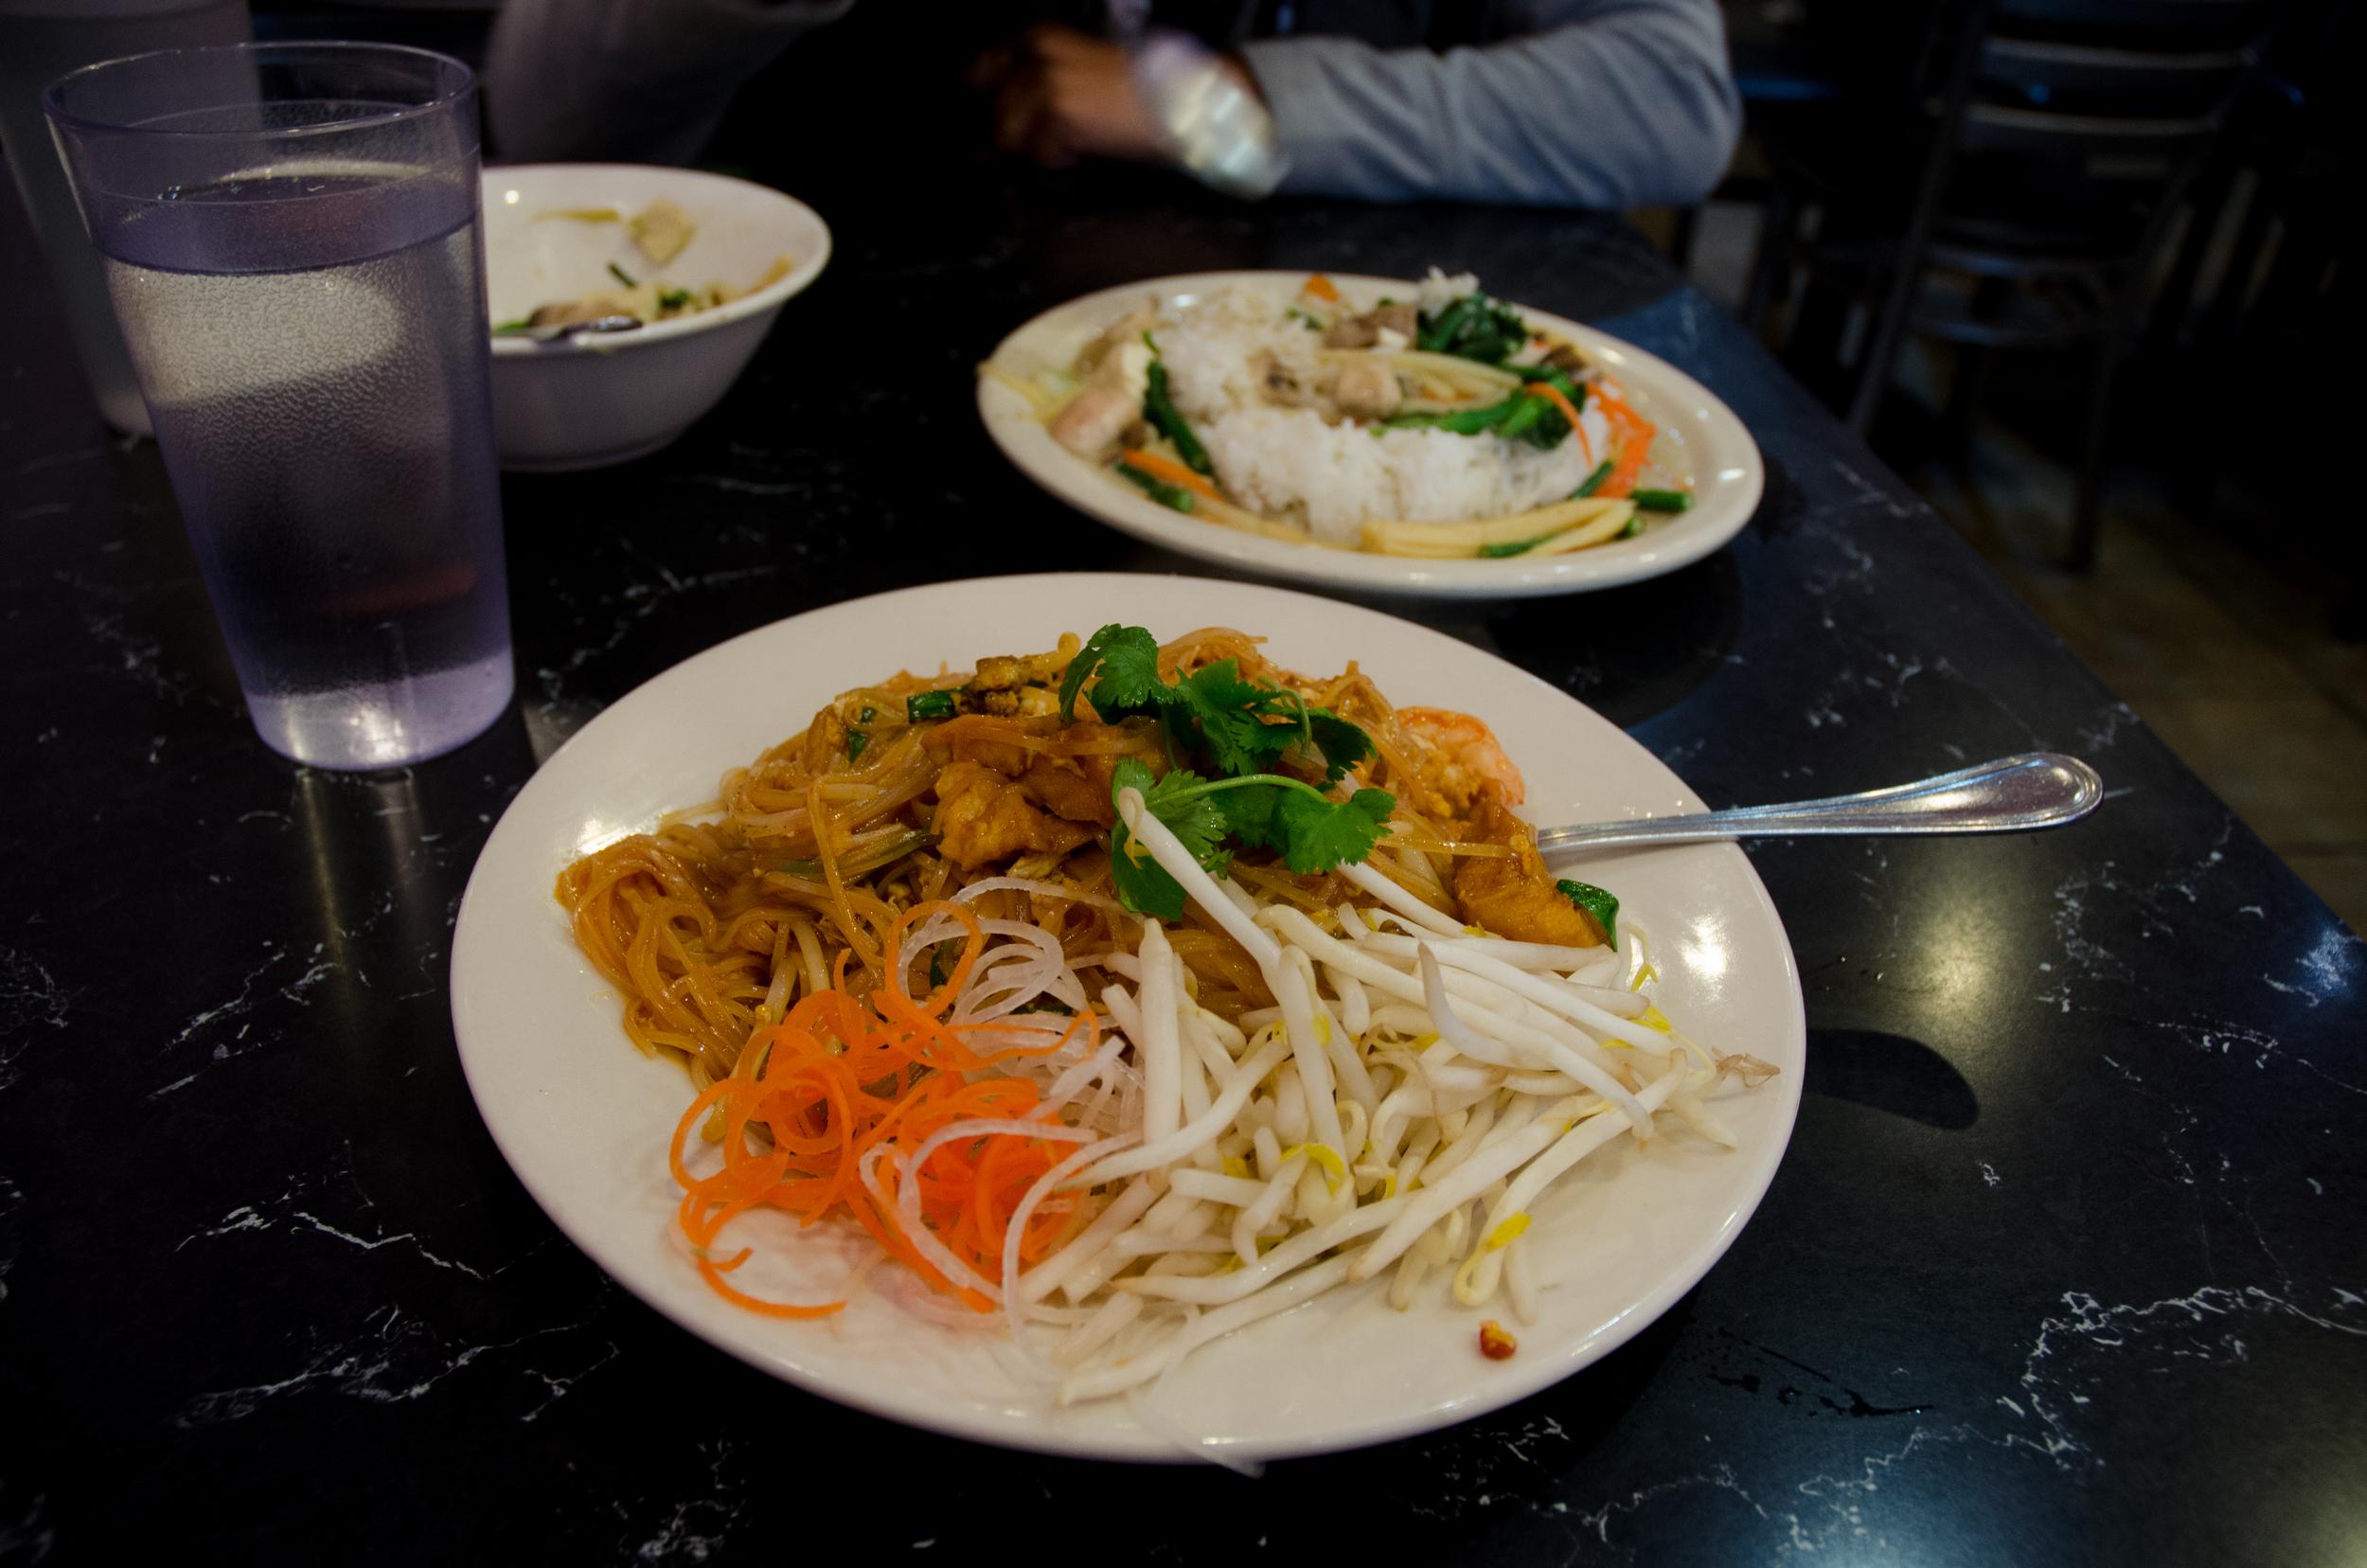 King of Thai - Chicken Pad Thai